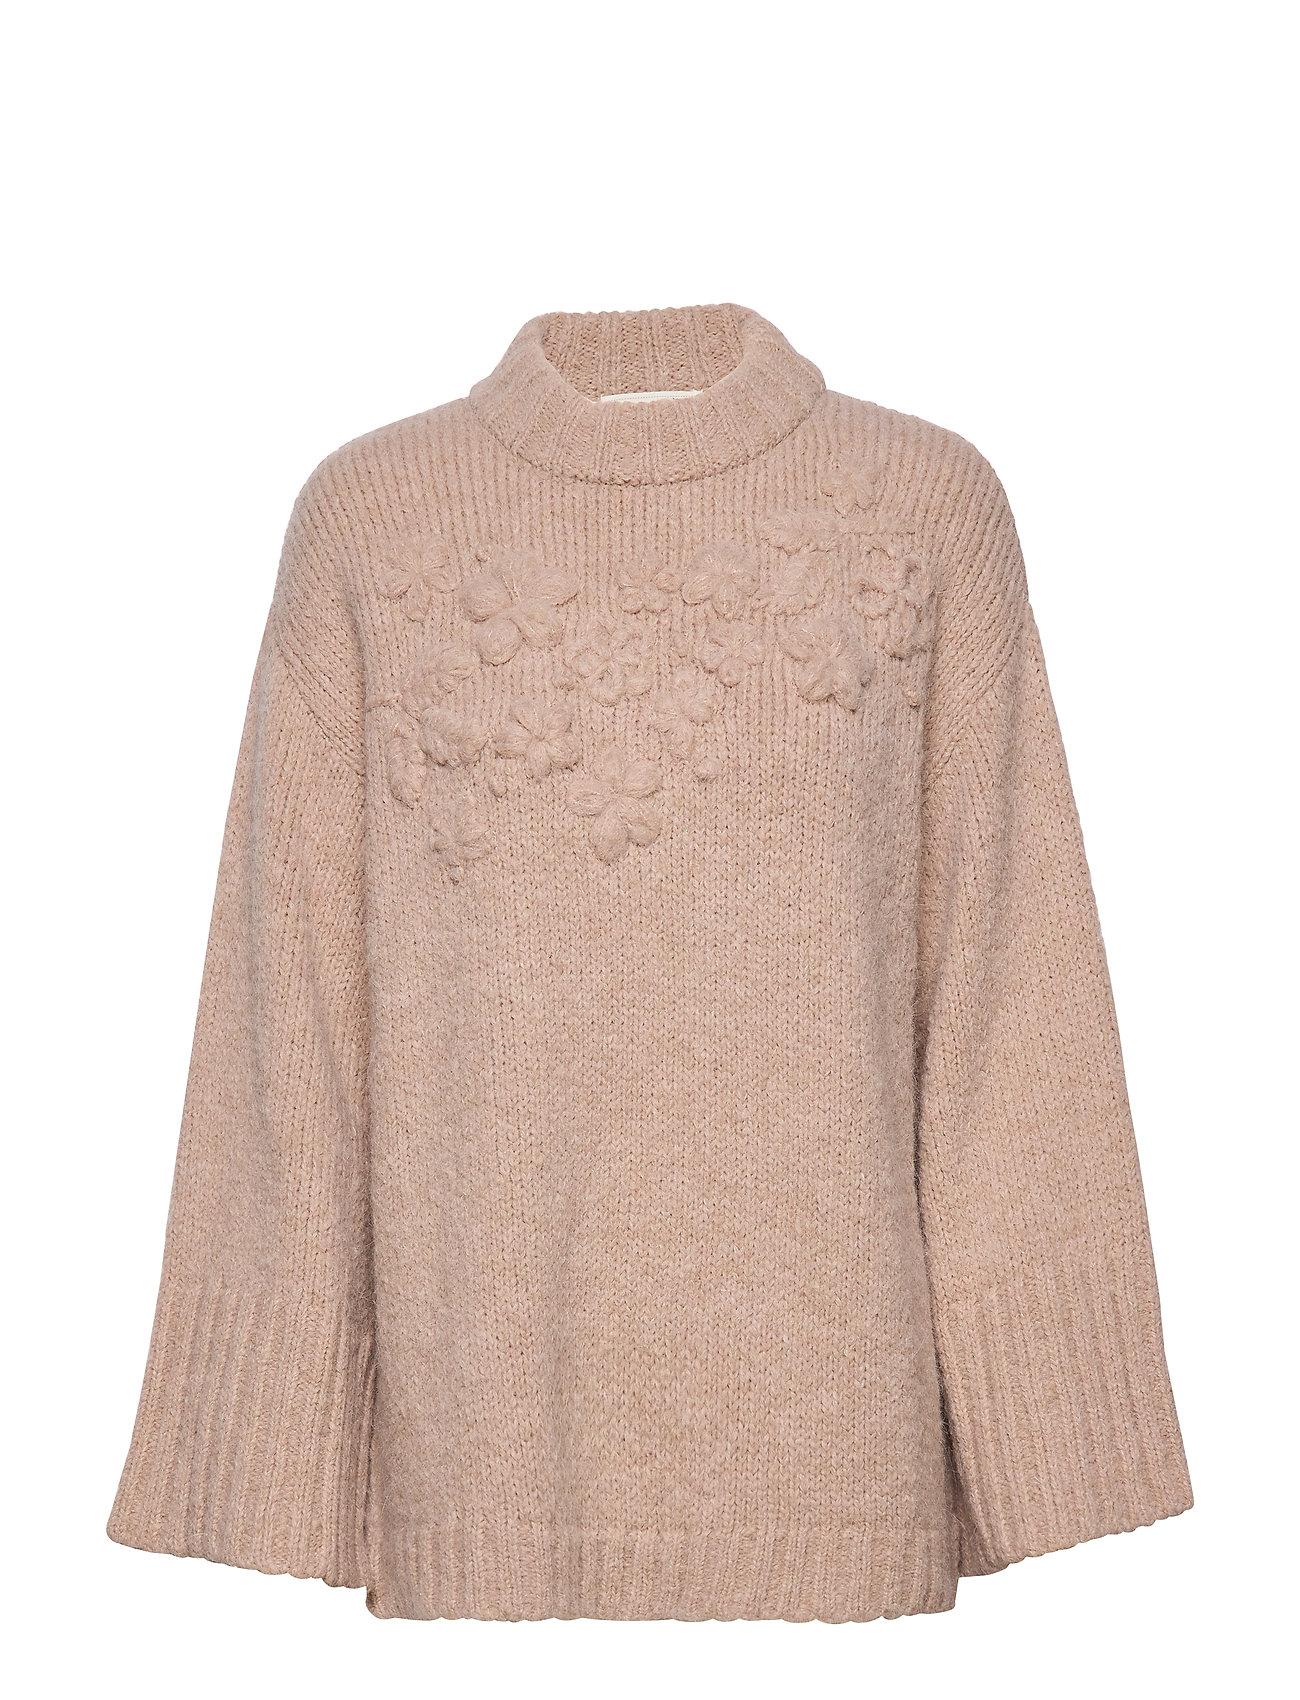 ODD MOLLY Life Coordinator Sweater - LIGHT TAUPE